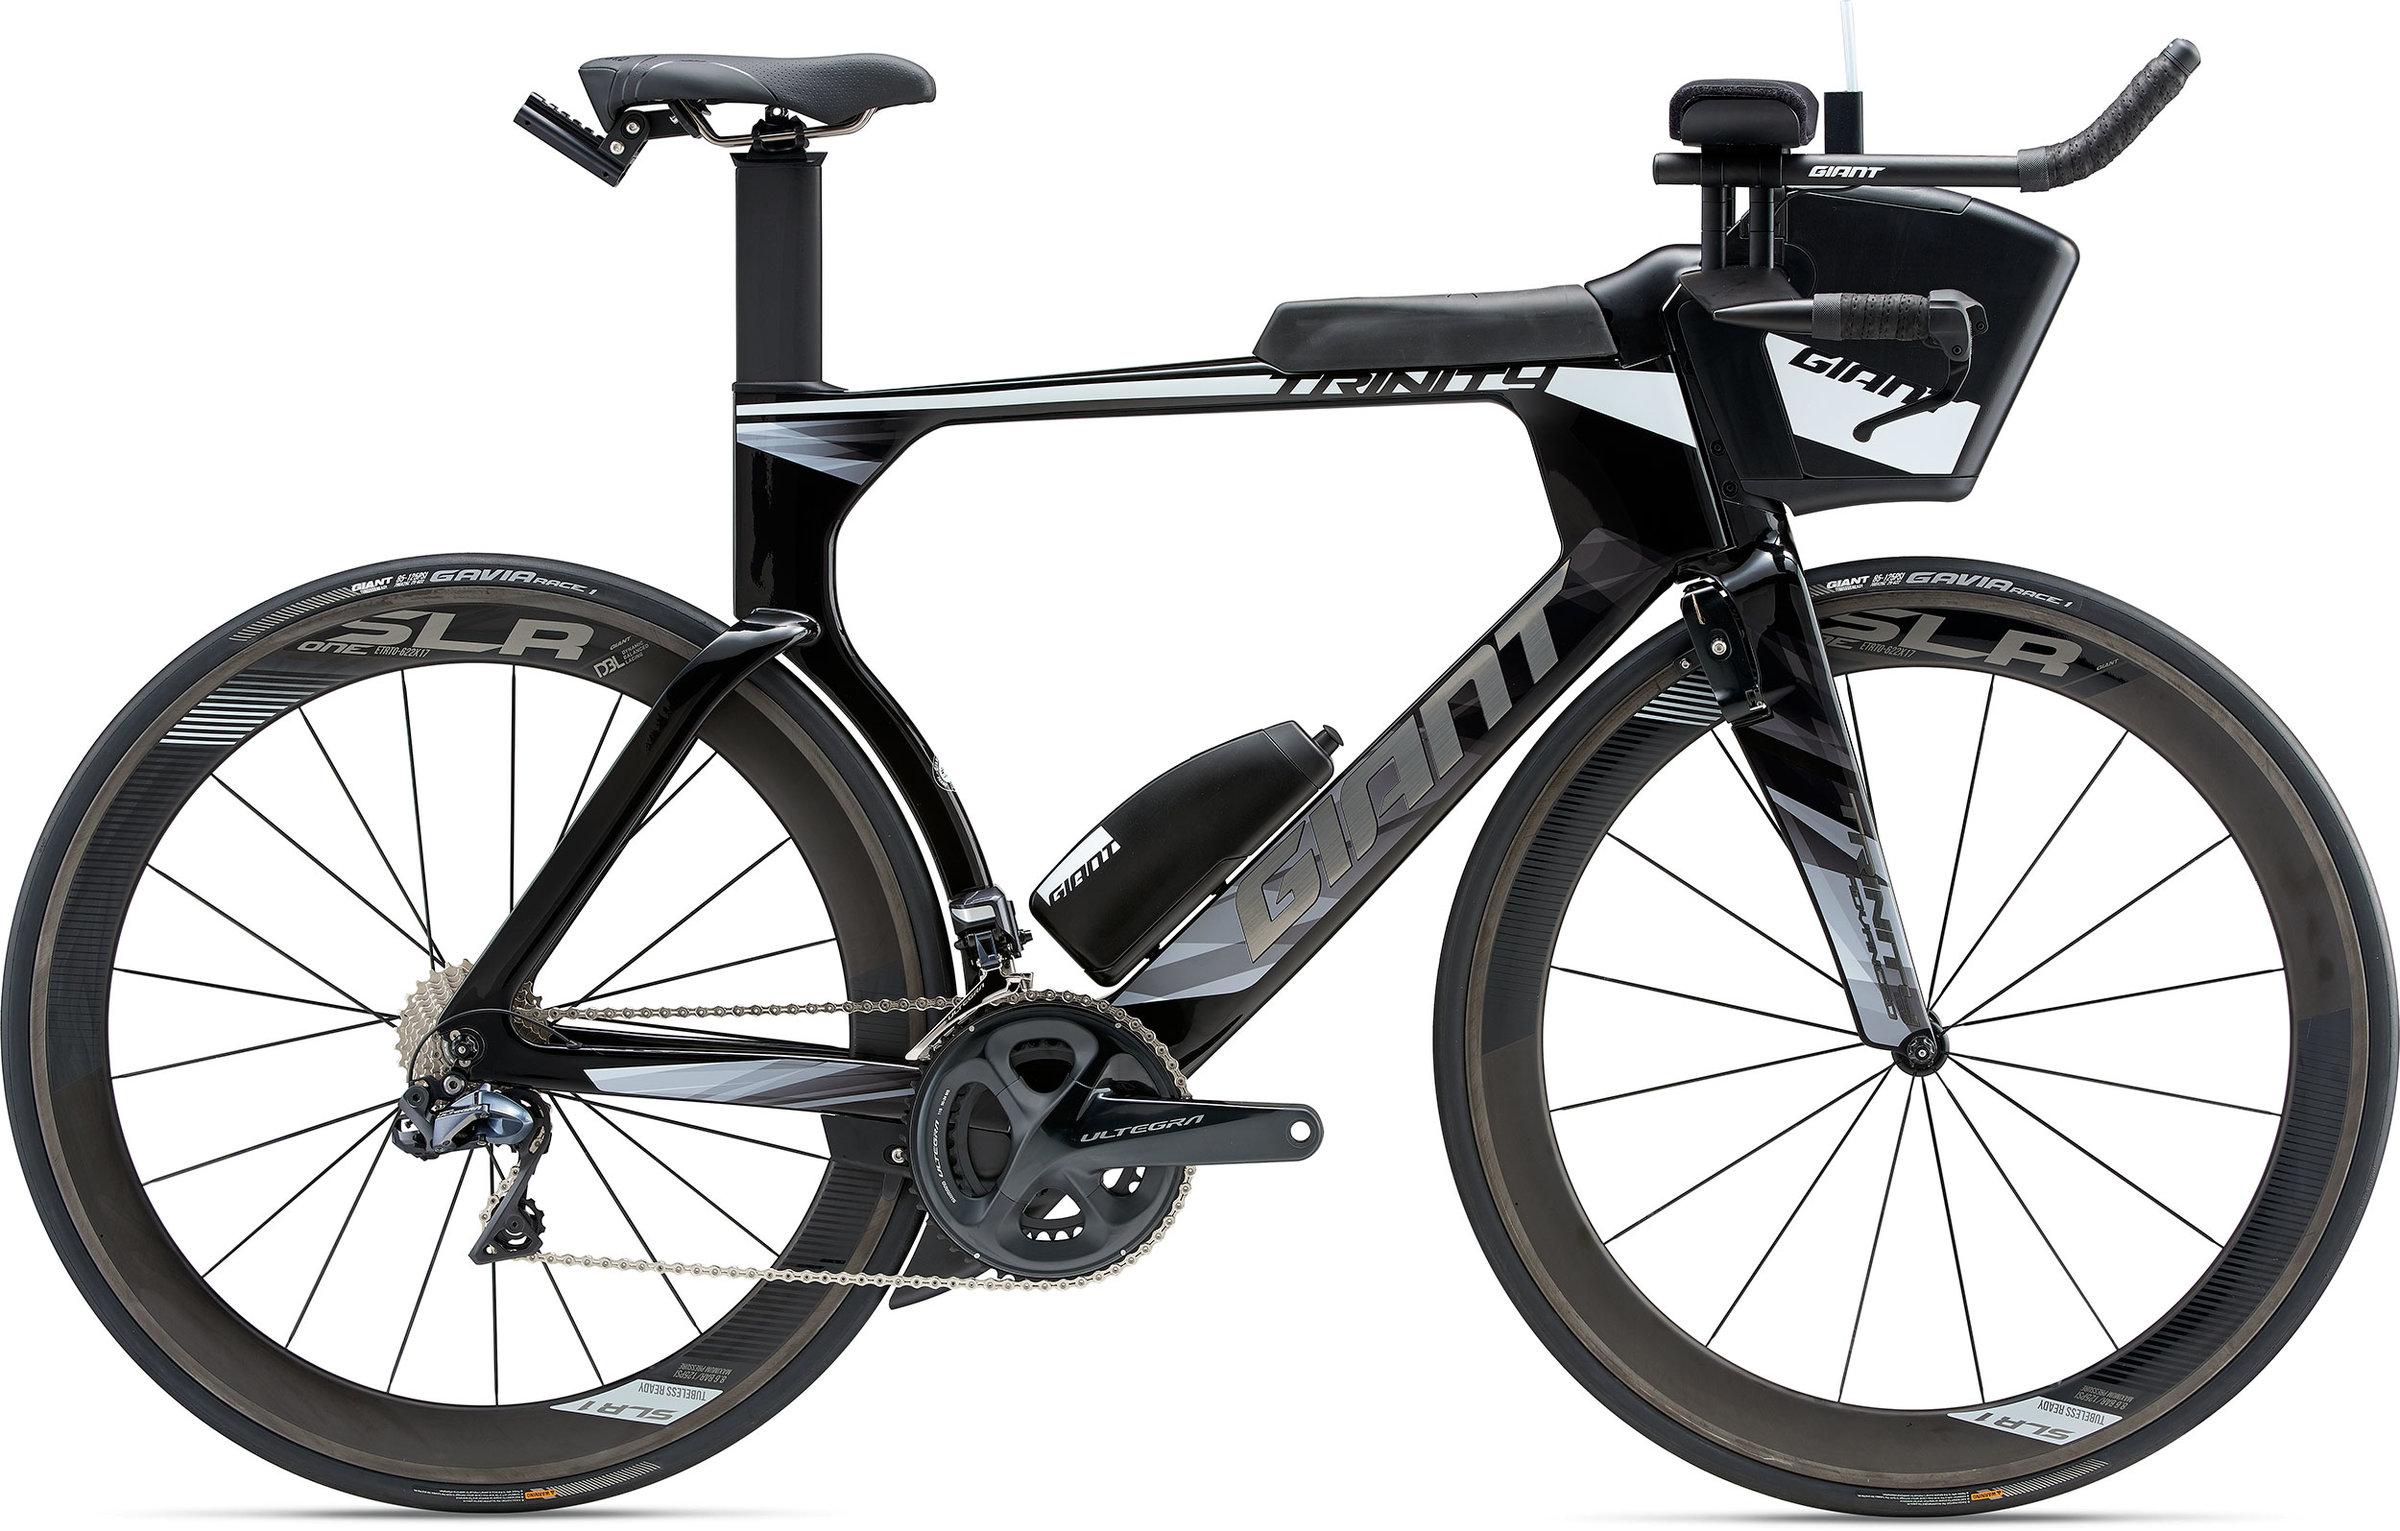 Giant Trinity Advanced Pro 1 - All-Star Bike Shops, Inc.